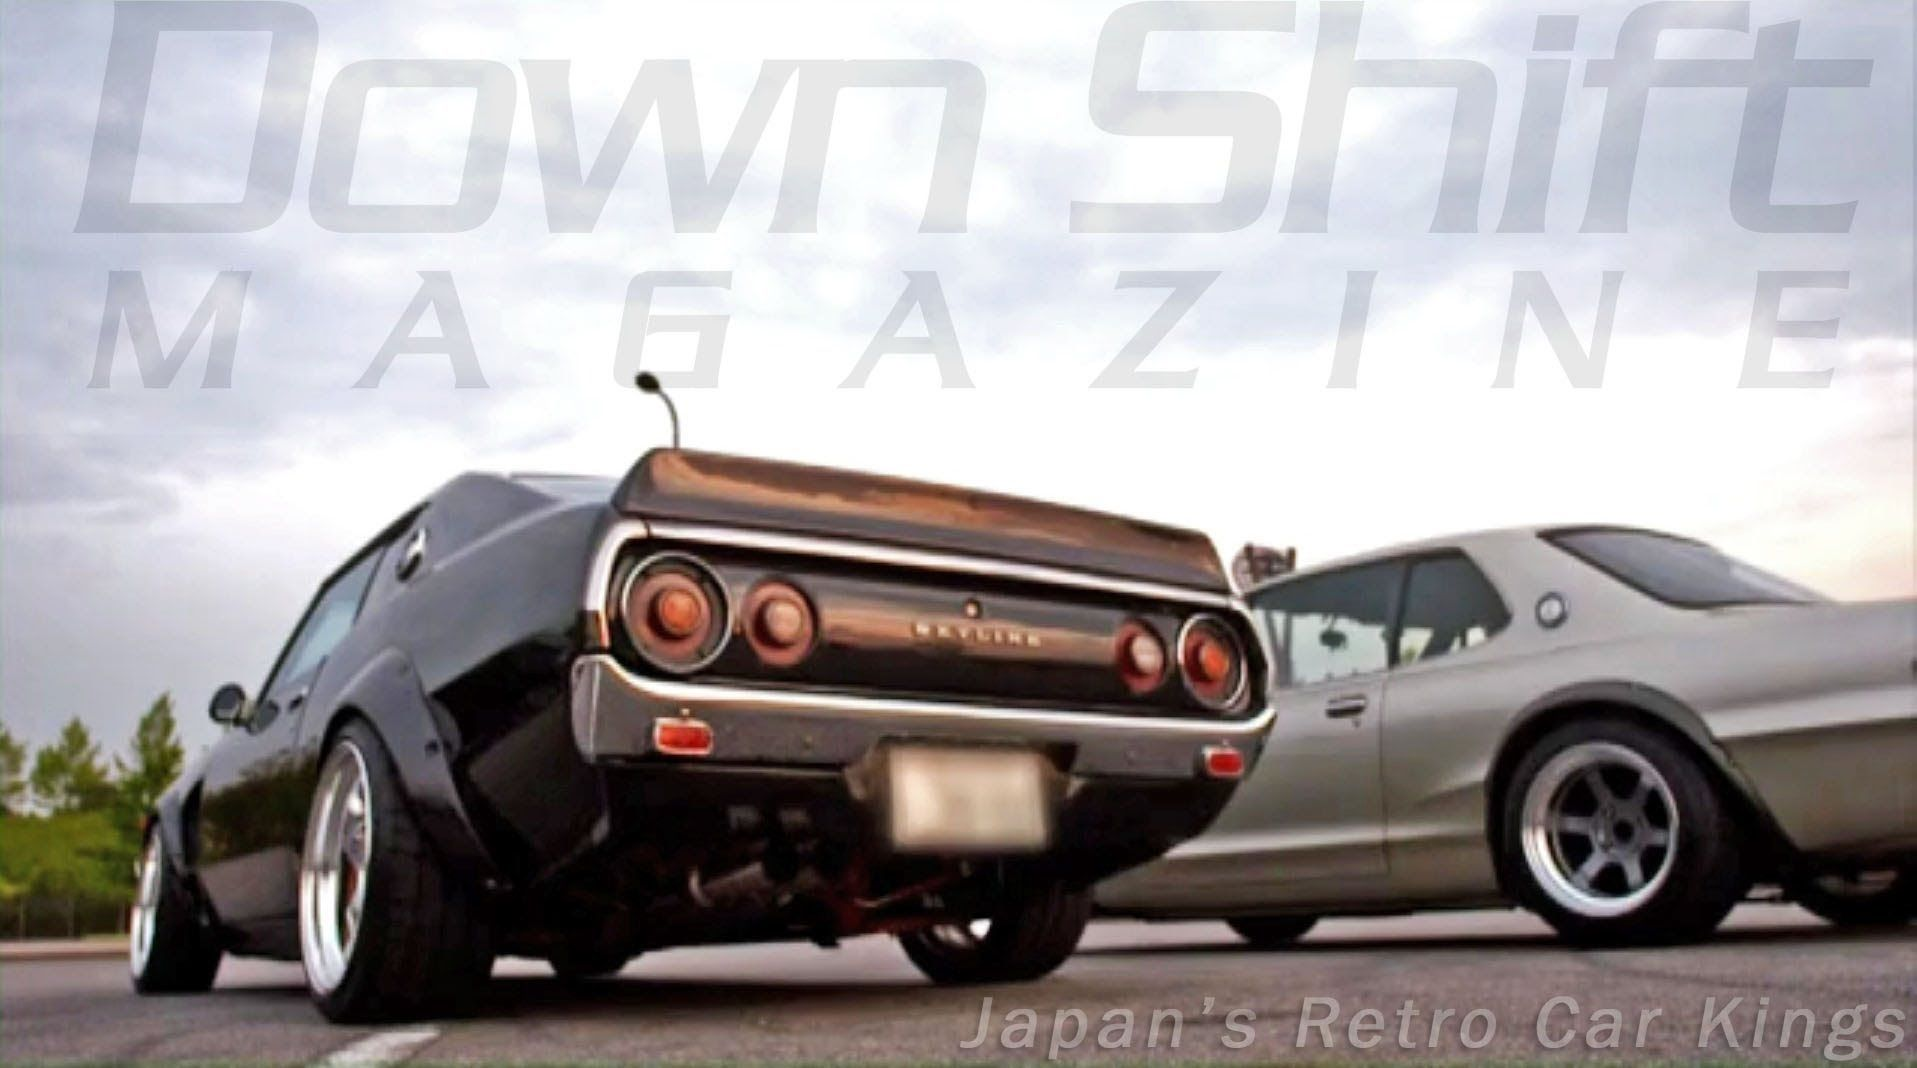 Japan S Retro Car Kings Saving Classic Japanese Automotive